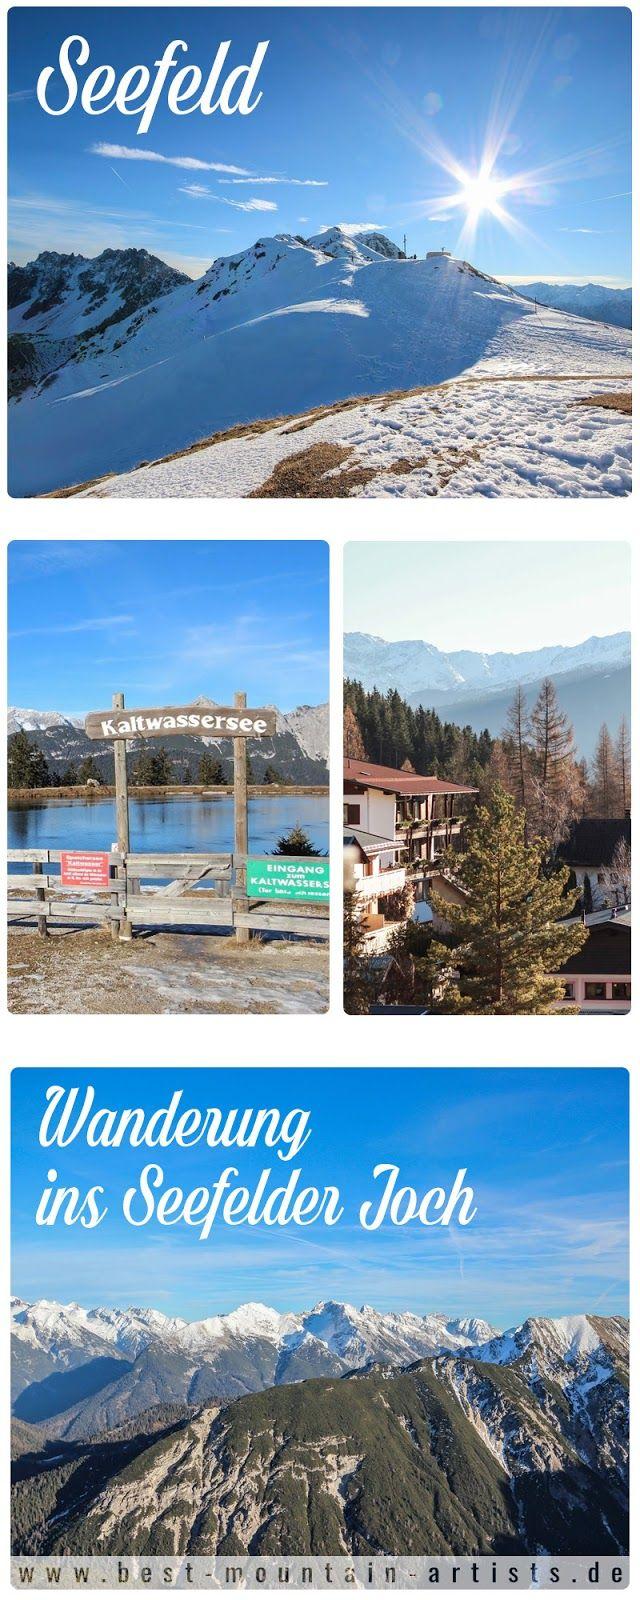 Dorint Alpin Resort Seefeld Tirol - Wanderung ins Seefelder Joch